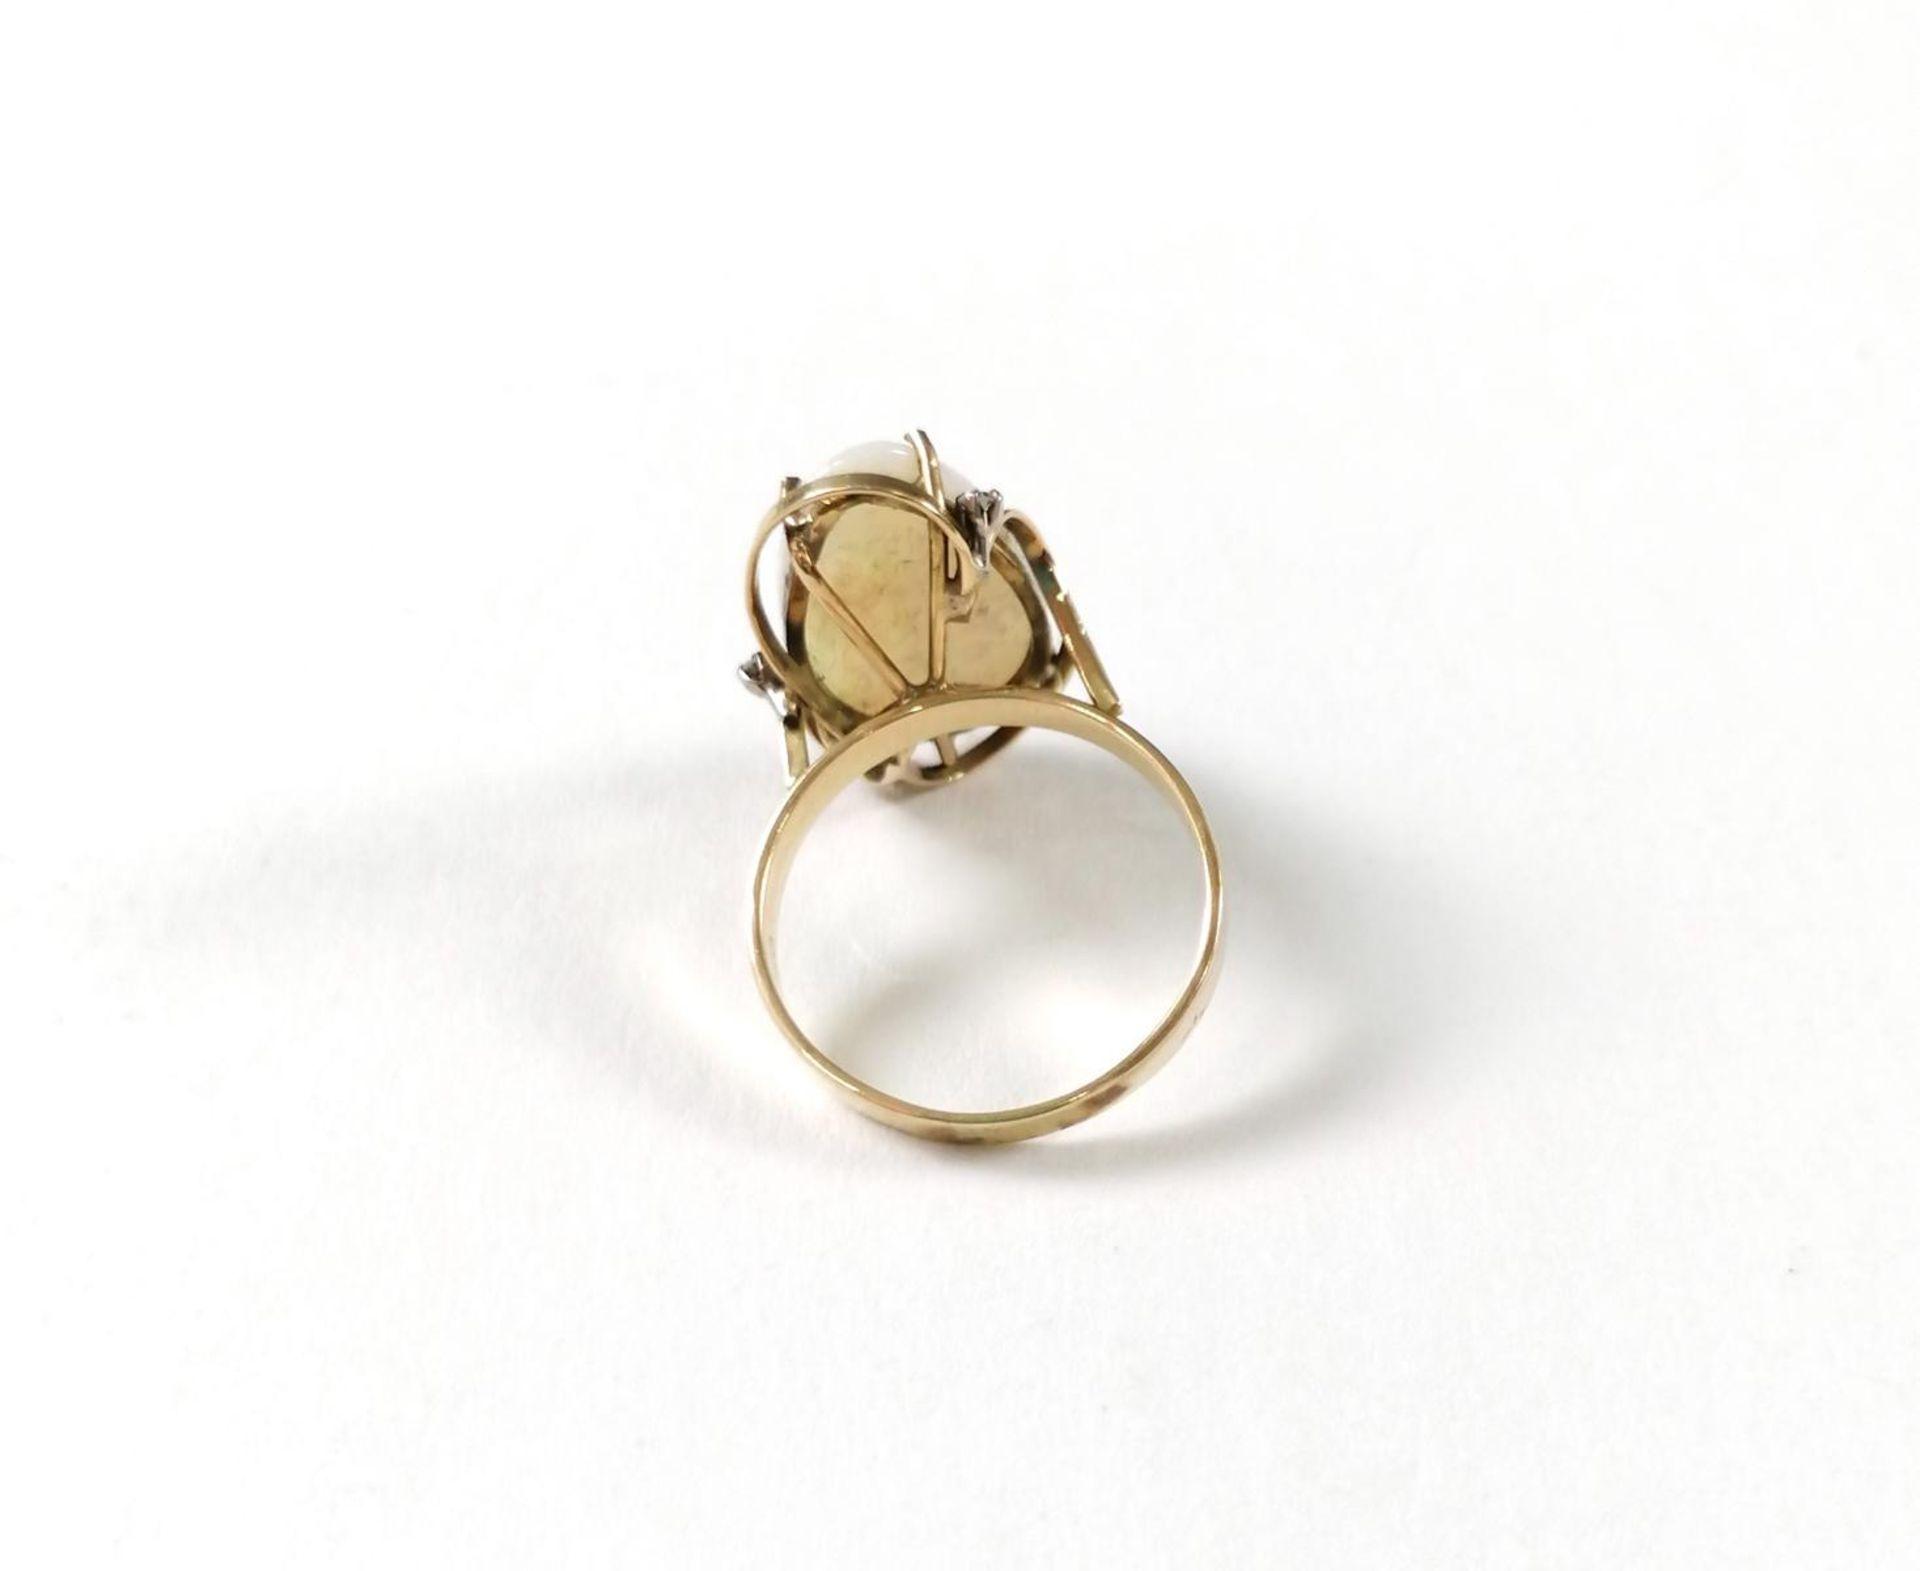 Gelbgold-Opalring mit Diamanten - Image 4 of 5